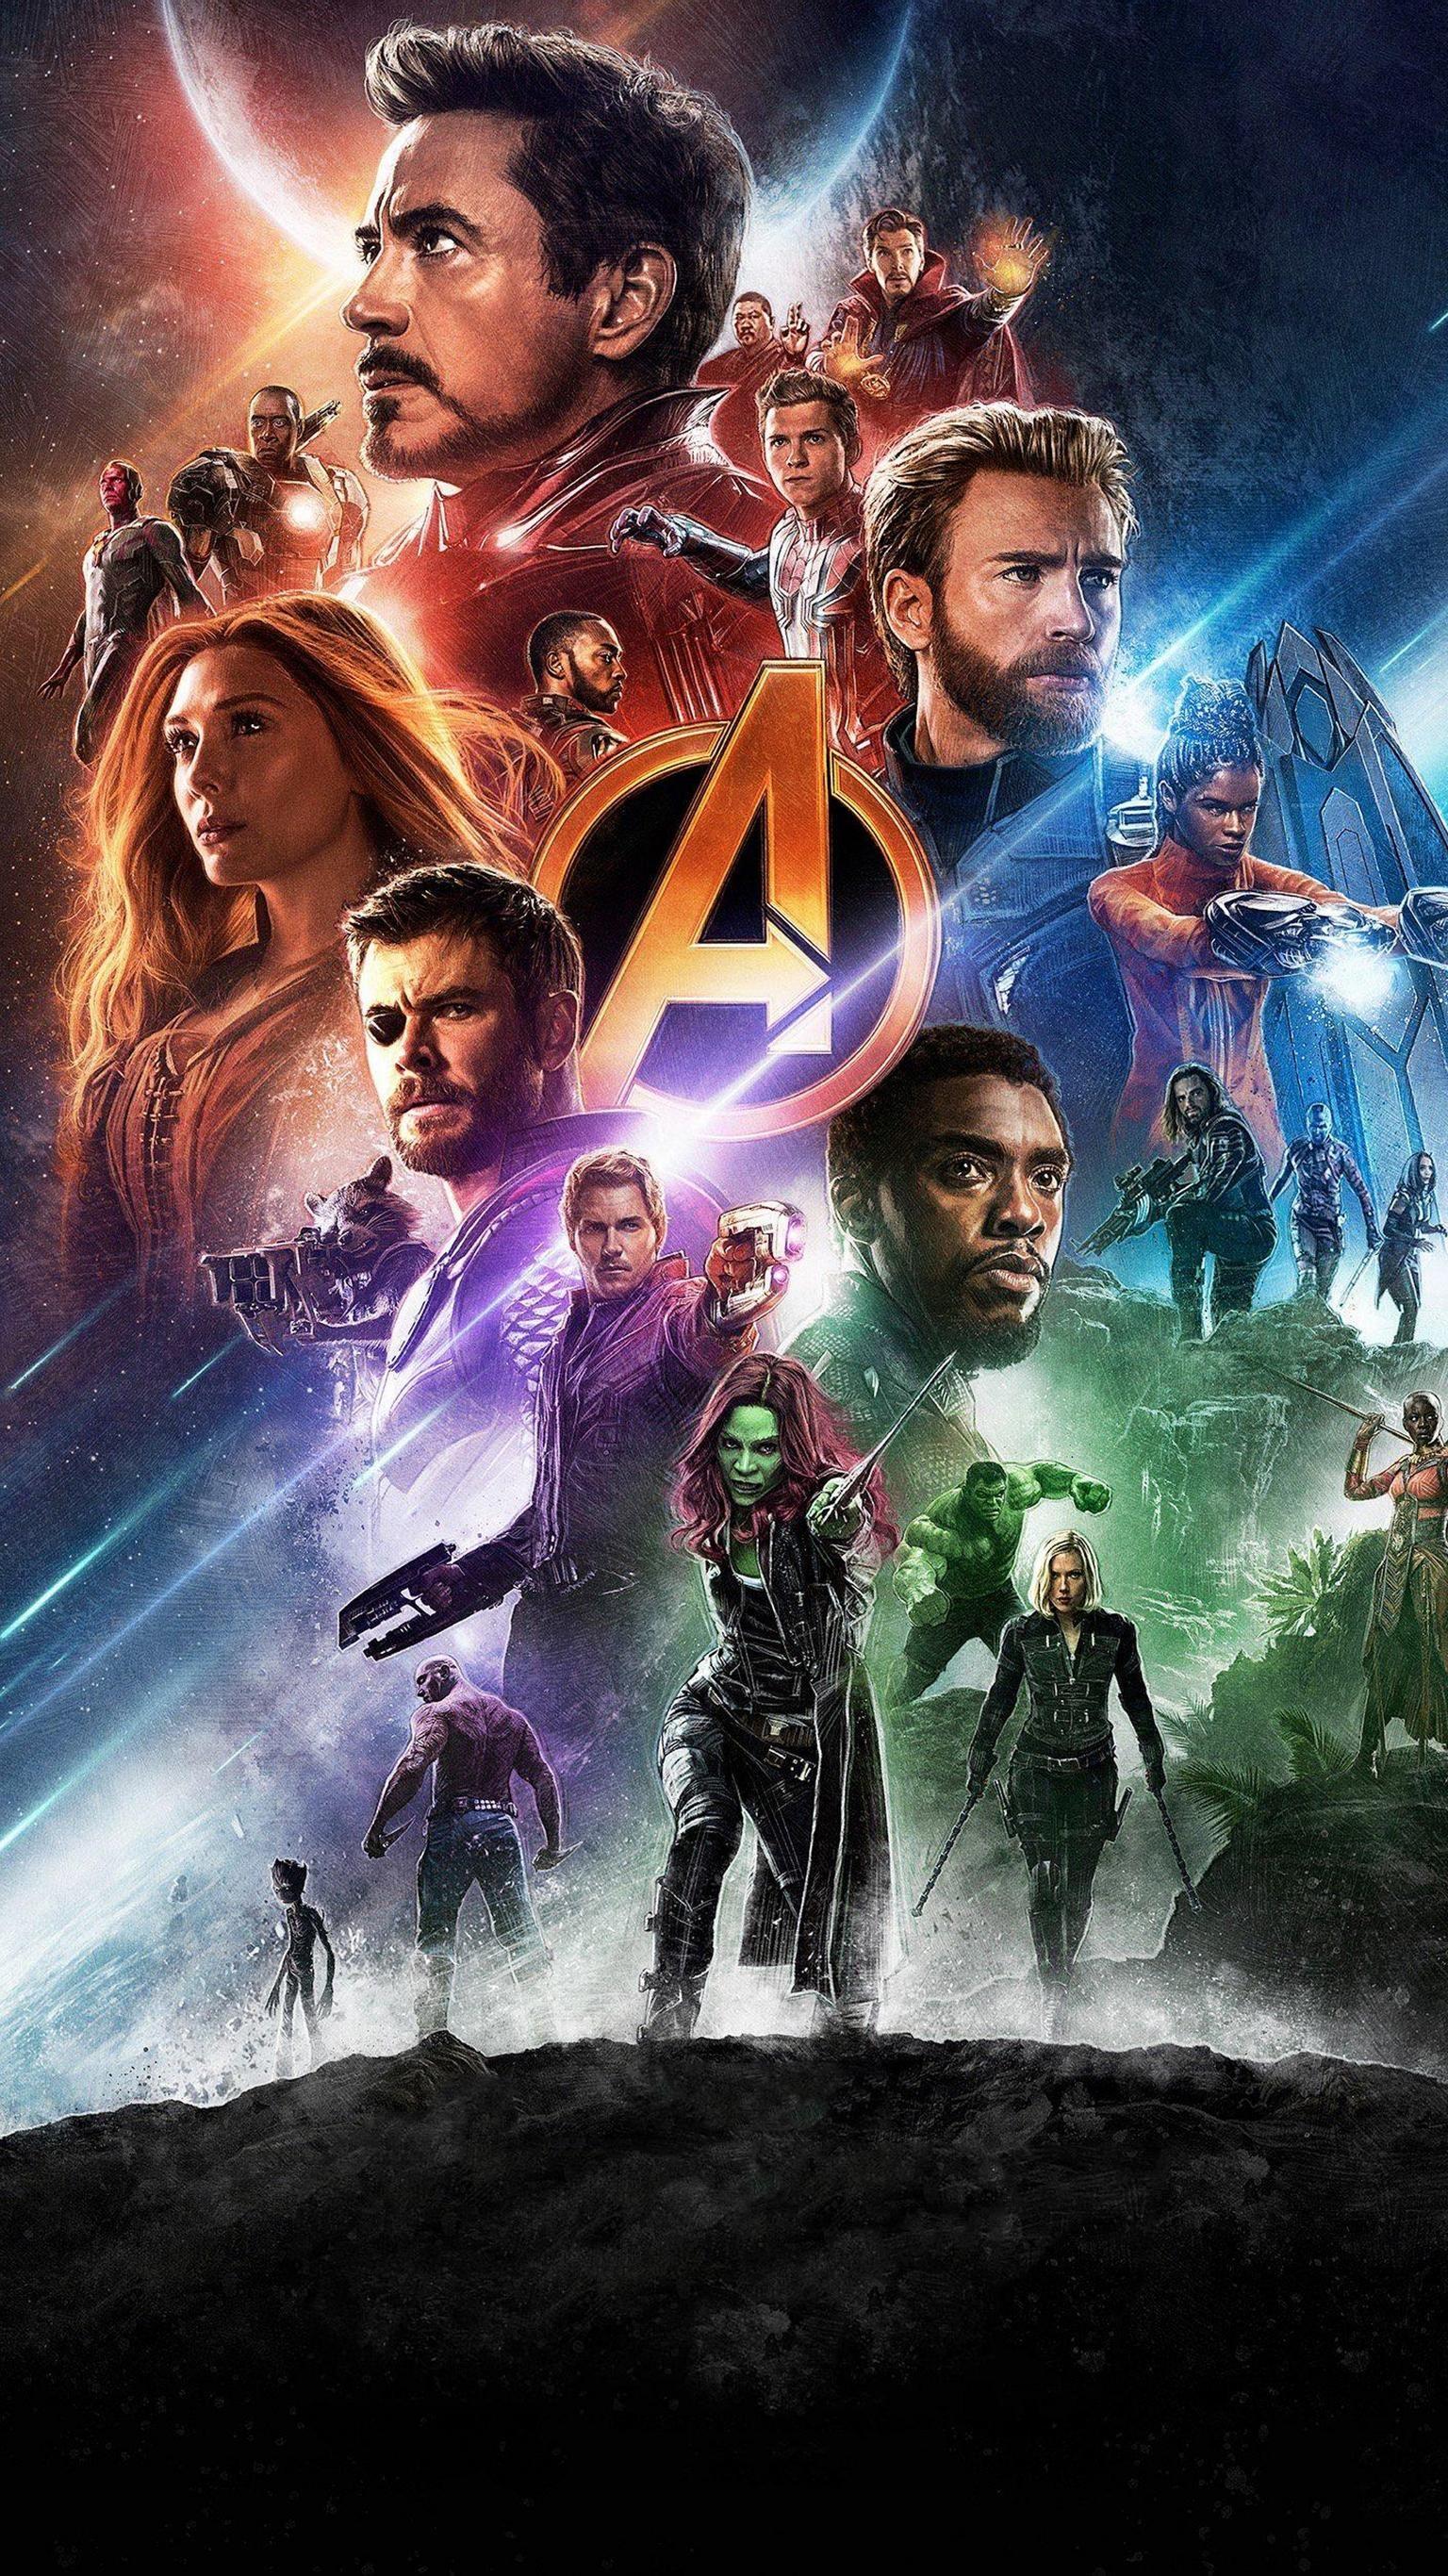 Avengers Infinity War 2018 Phone Wallpaper Moviemania In 2021 Marvel Comics Wallpaper Marvel Avengers Movies Avengers Poster